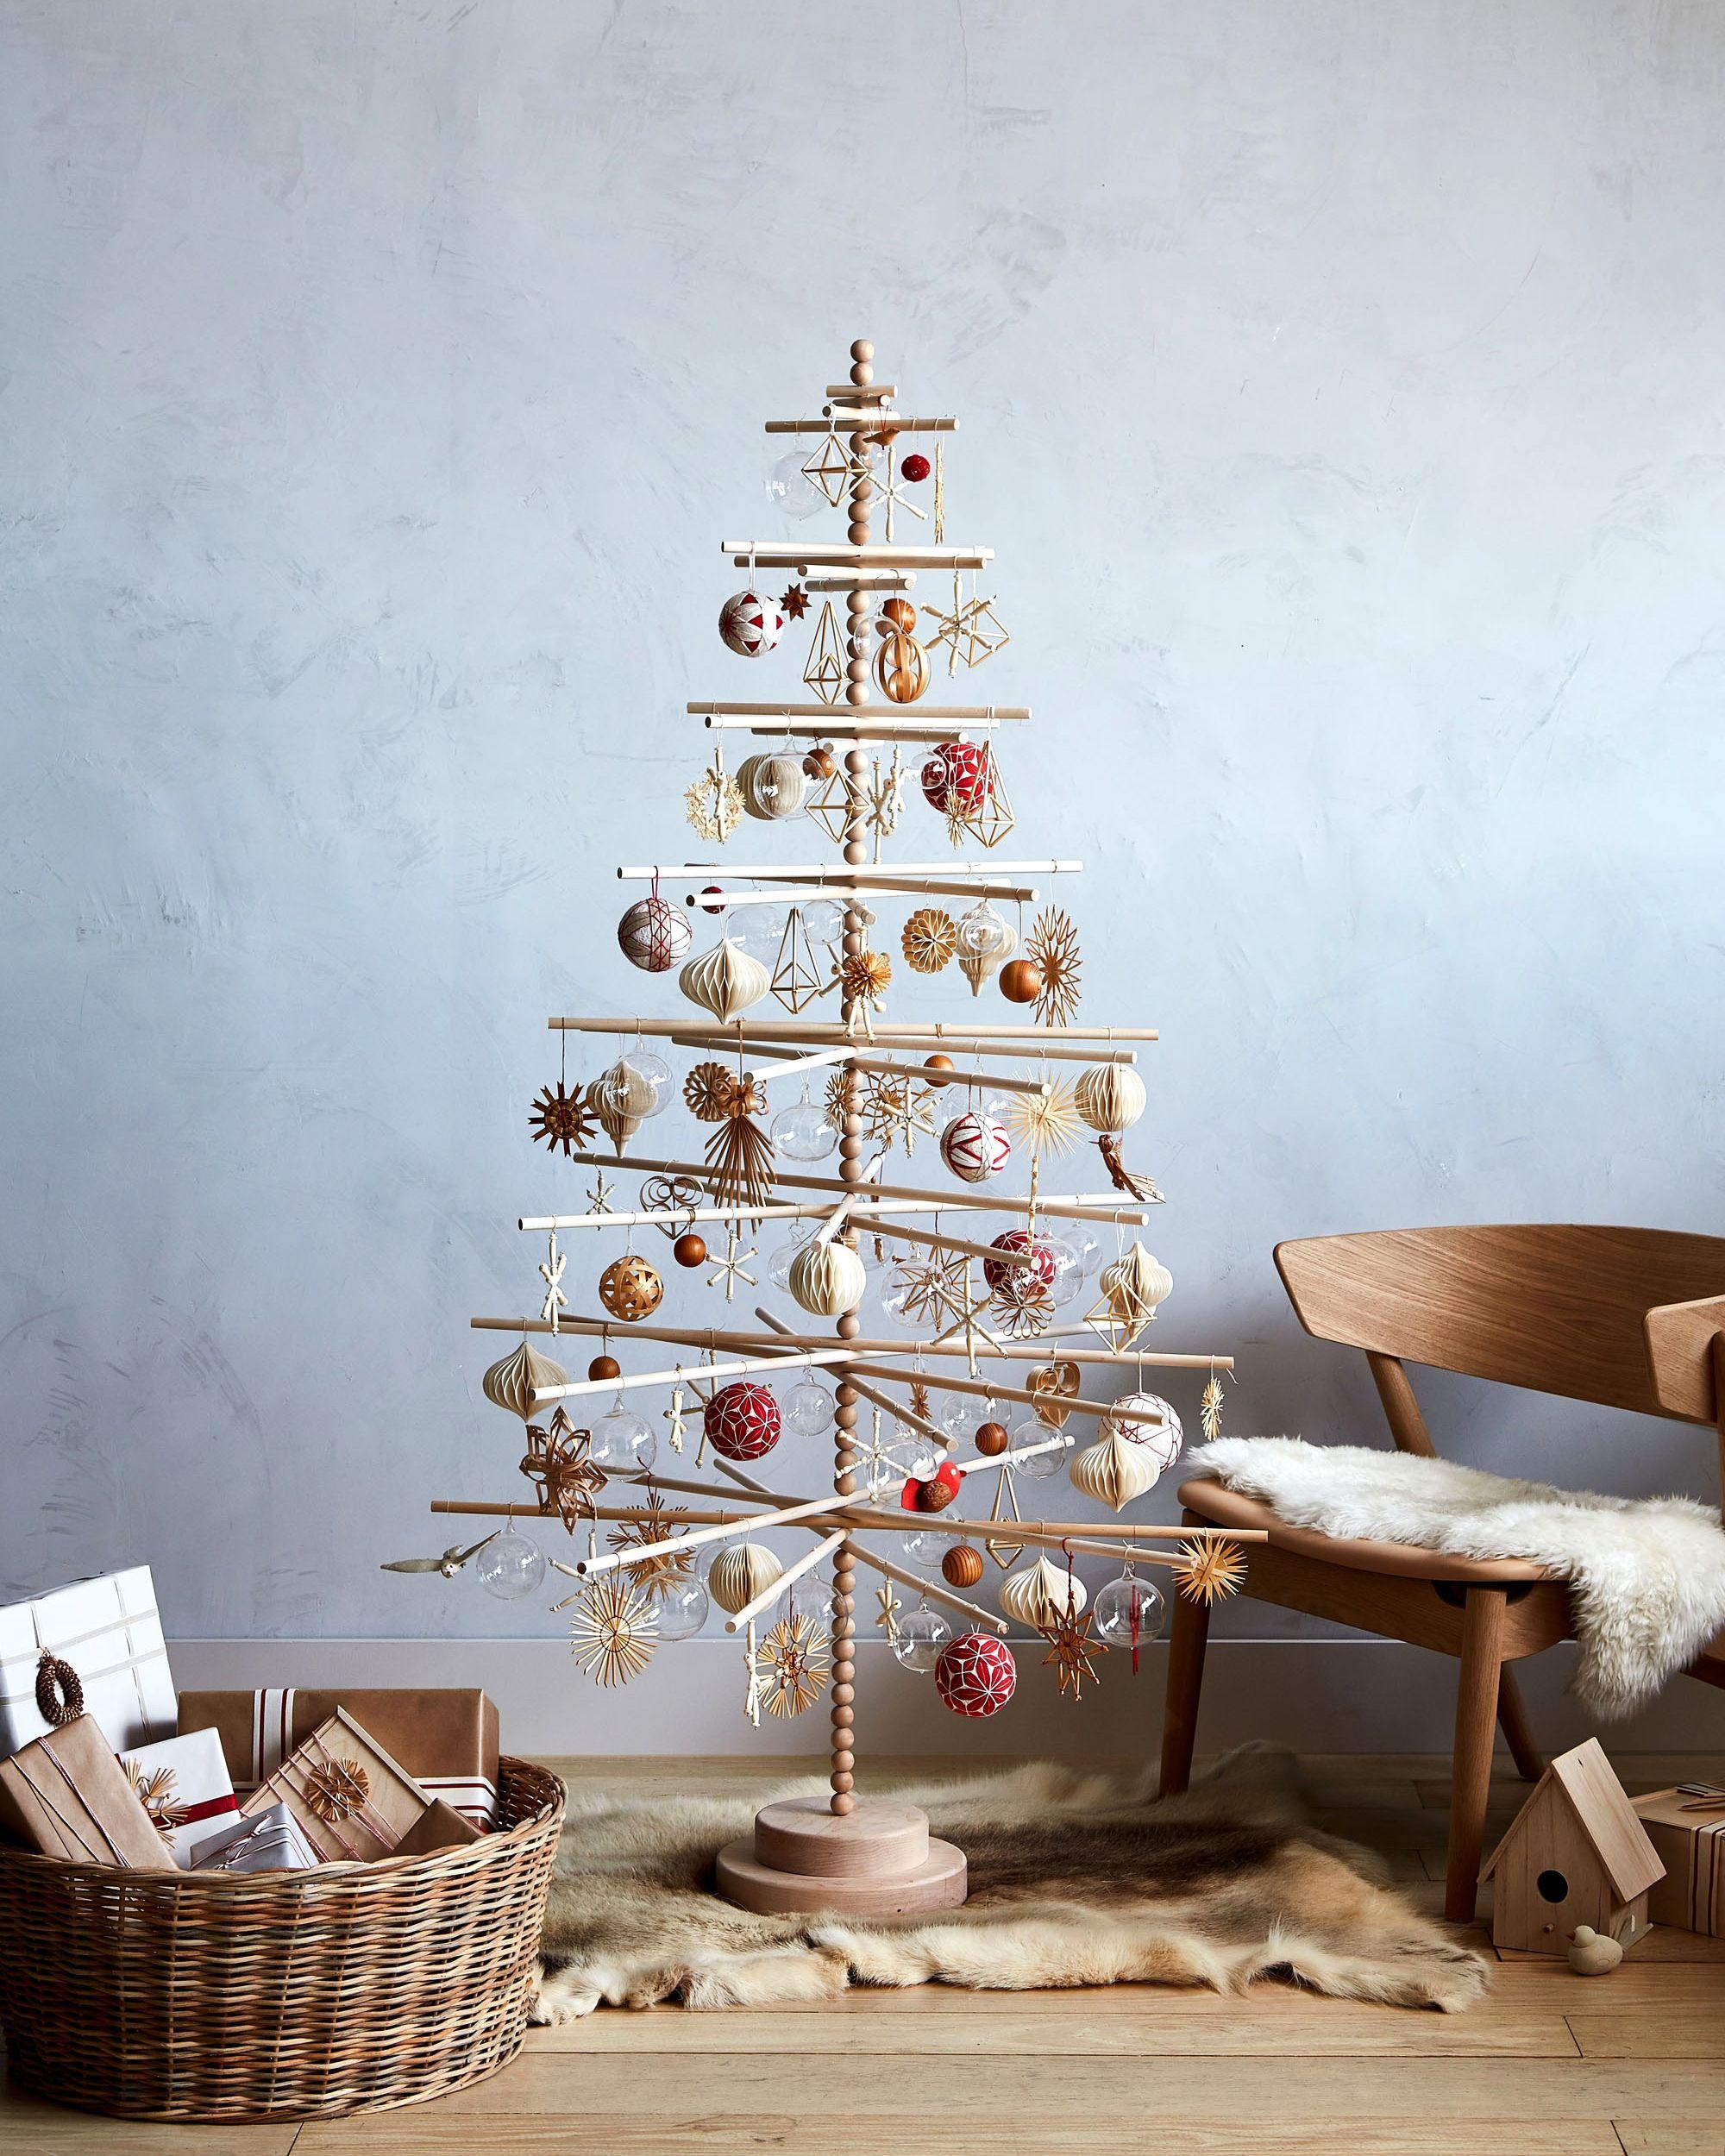 25 Minimalist Christmas Tree Decor Ideas for Your Small ...